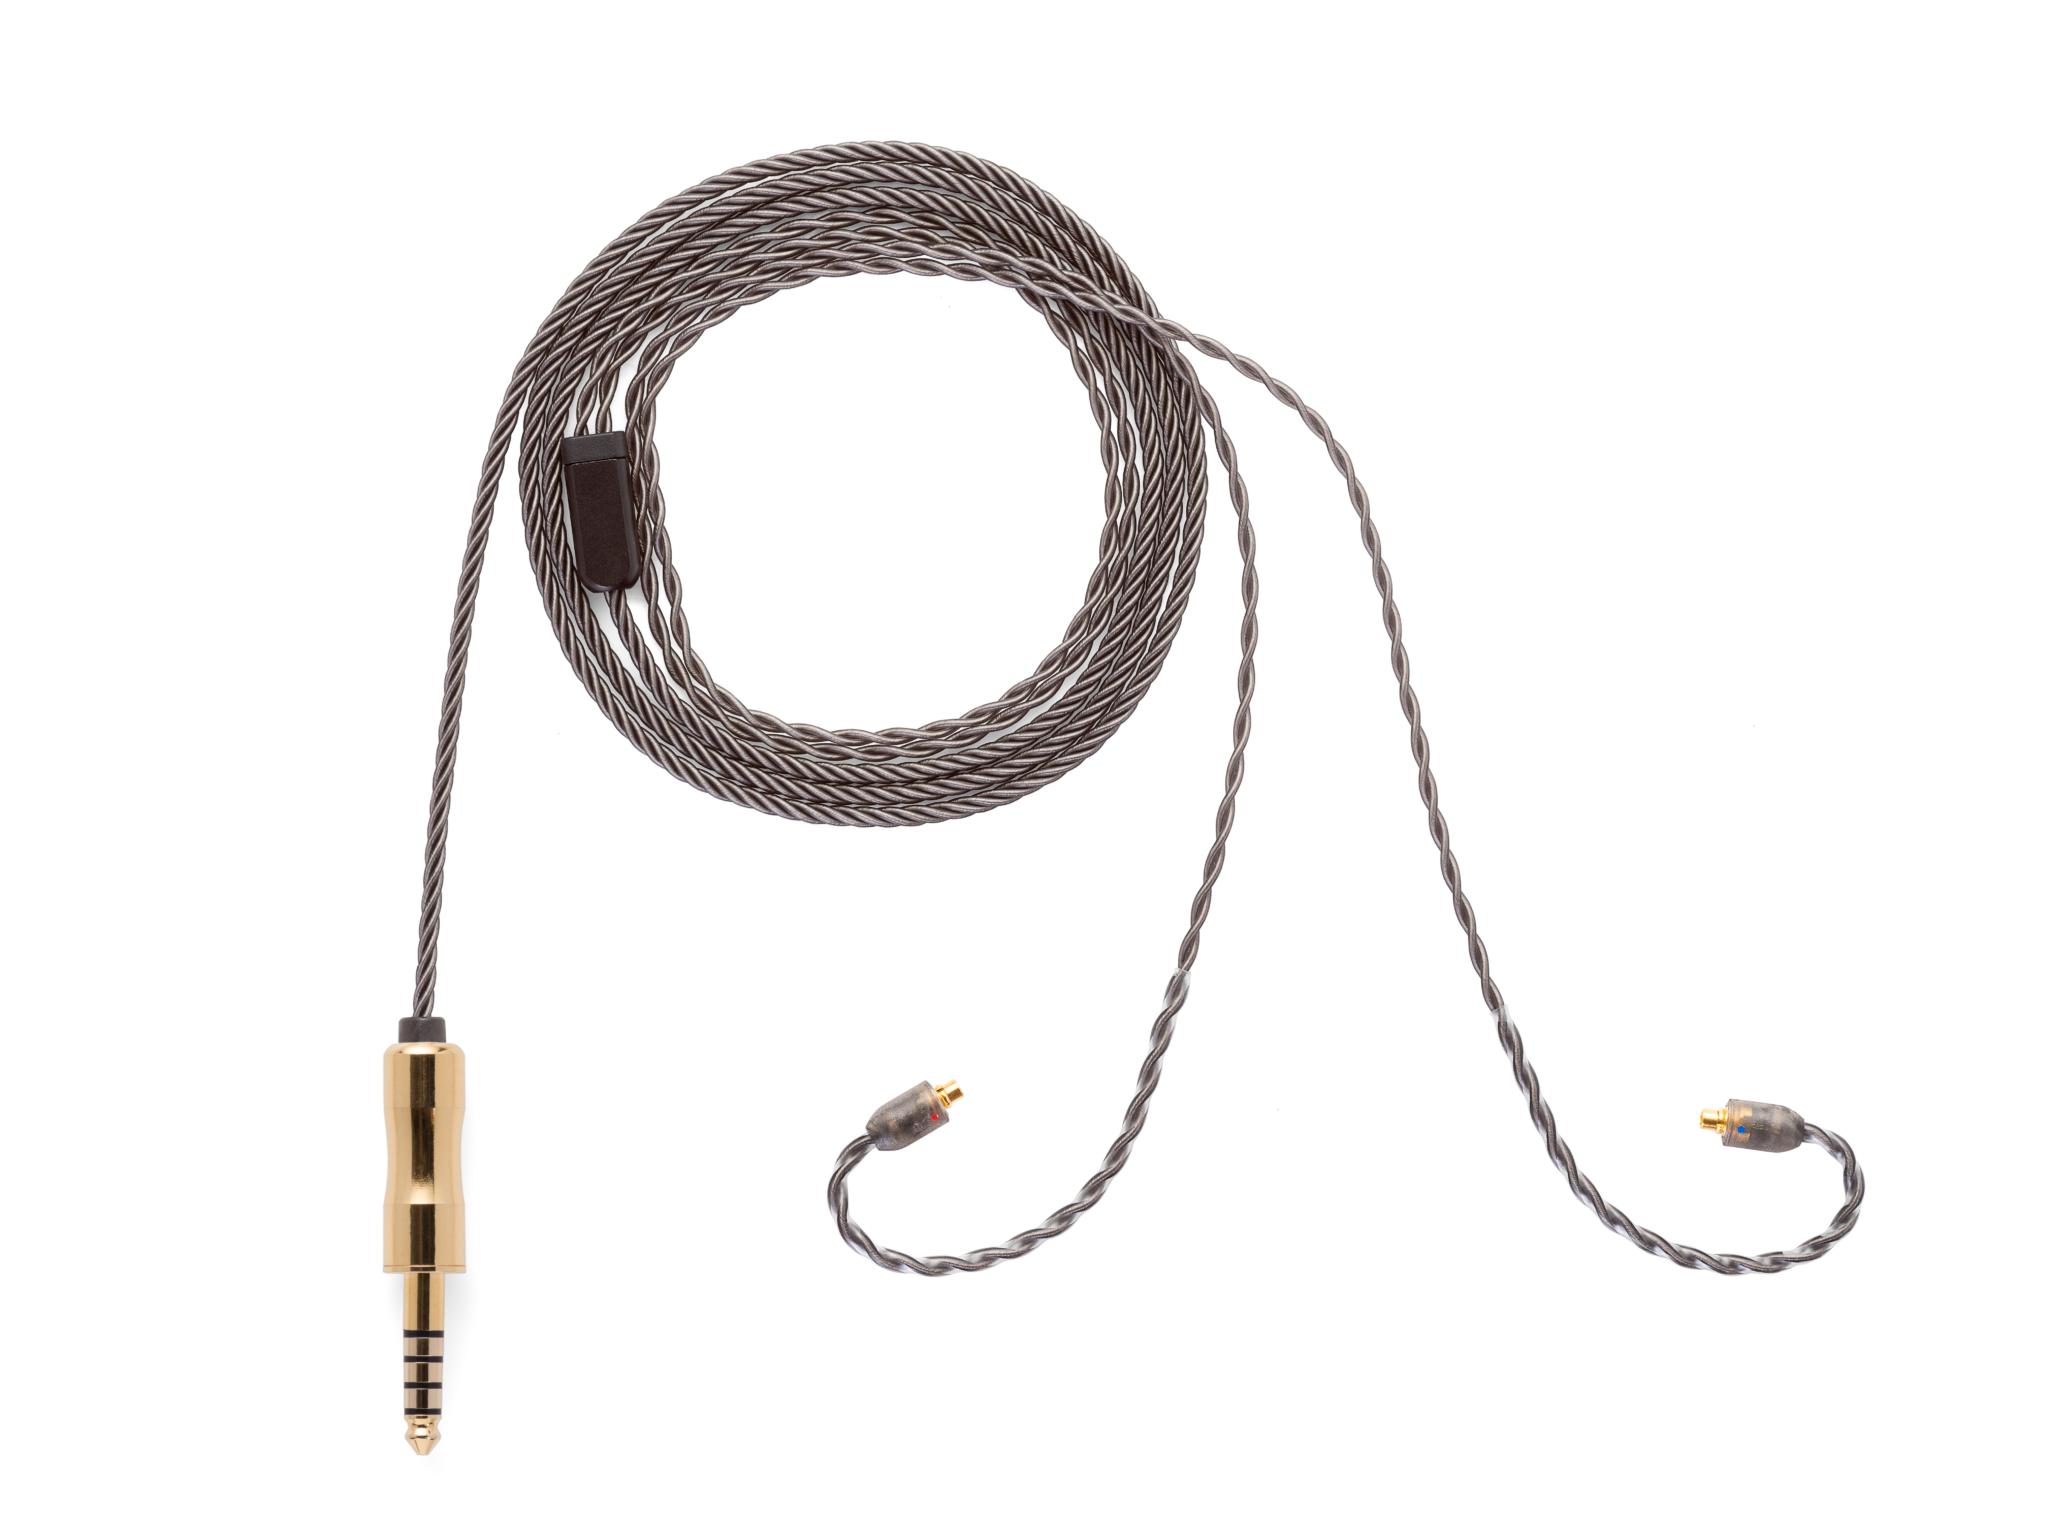 campfire audio smoky litz cable 4.4mm termination